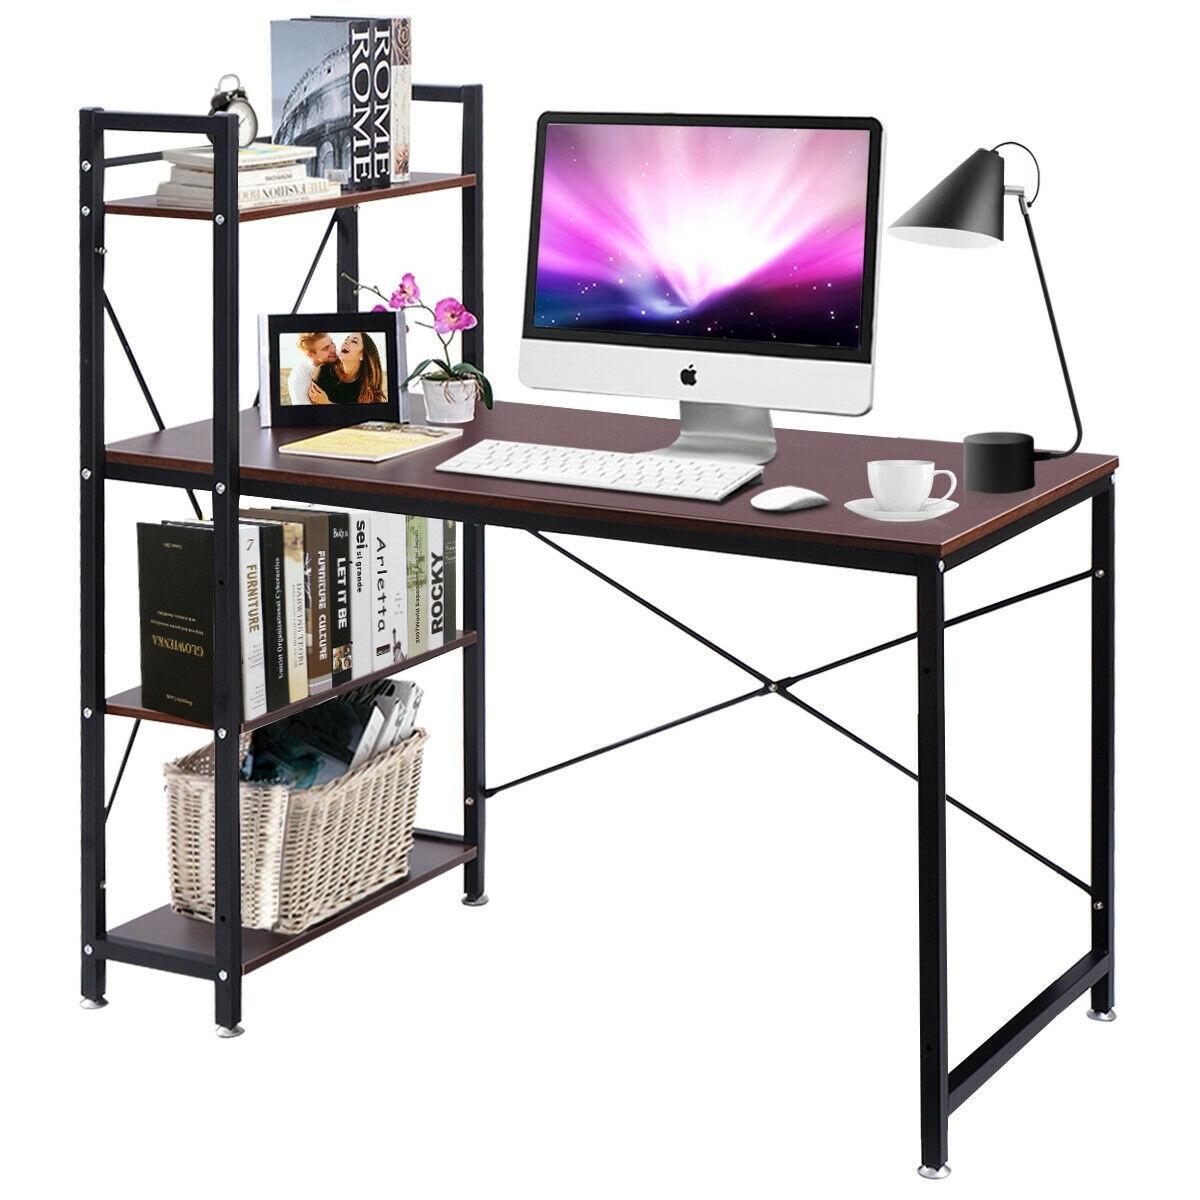 Modern Computer Desk Study Table PC Laptop Workstation Home Office Furniture